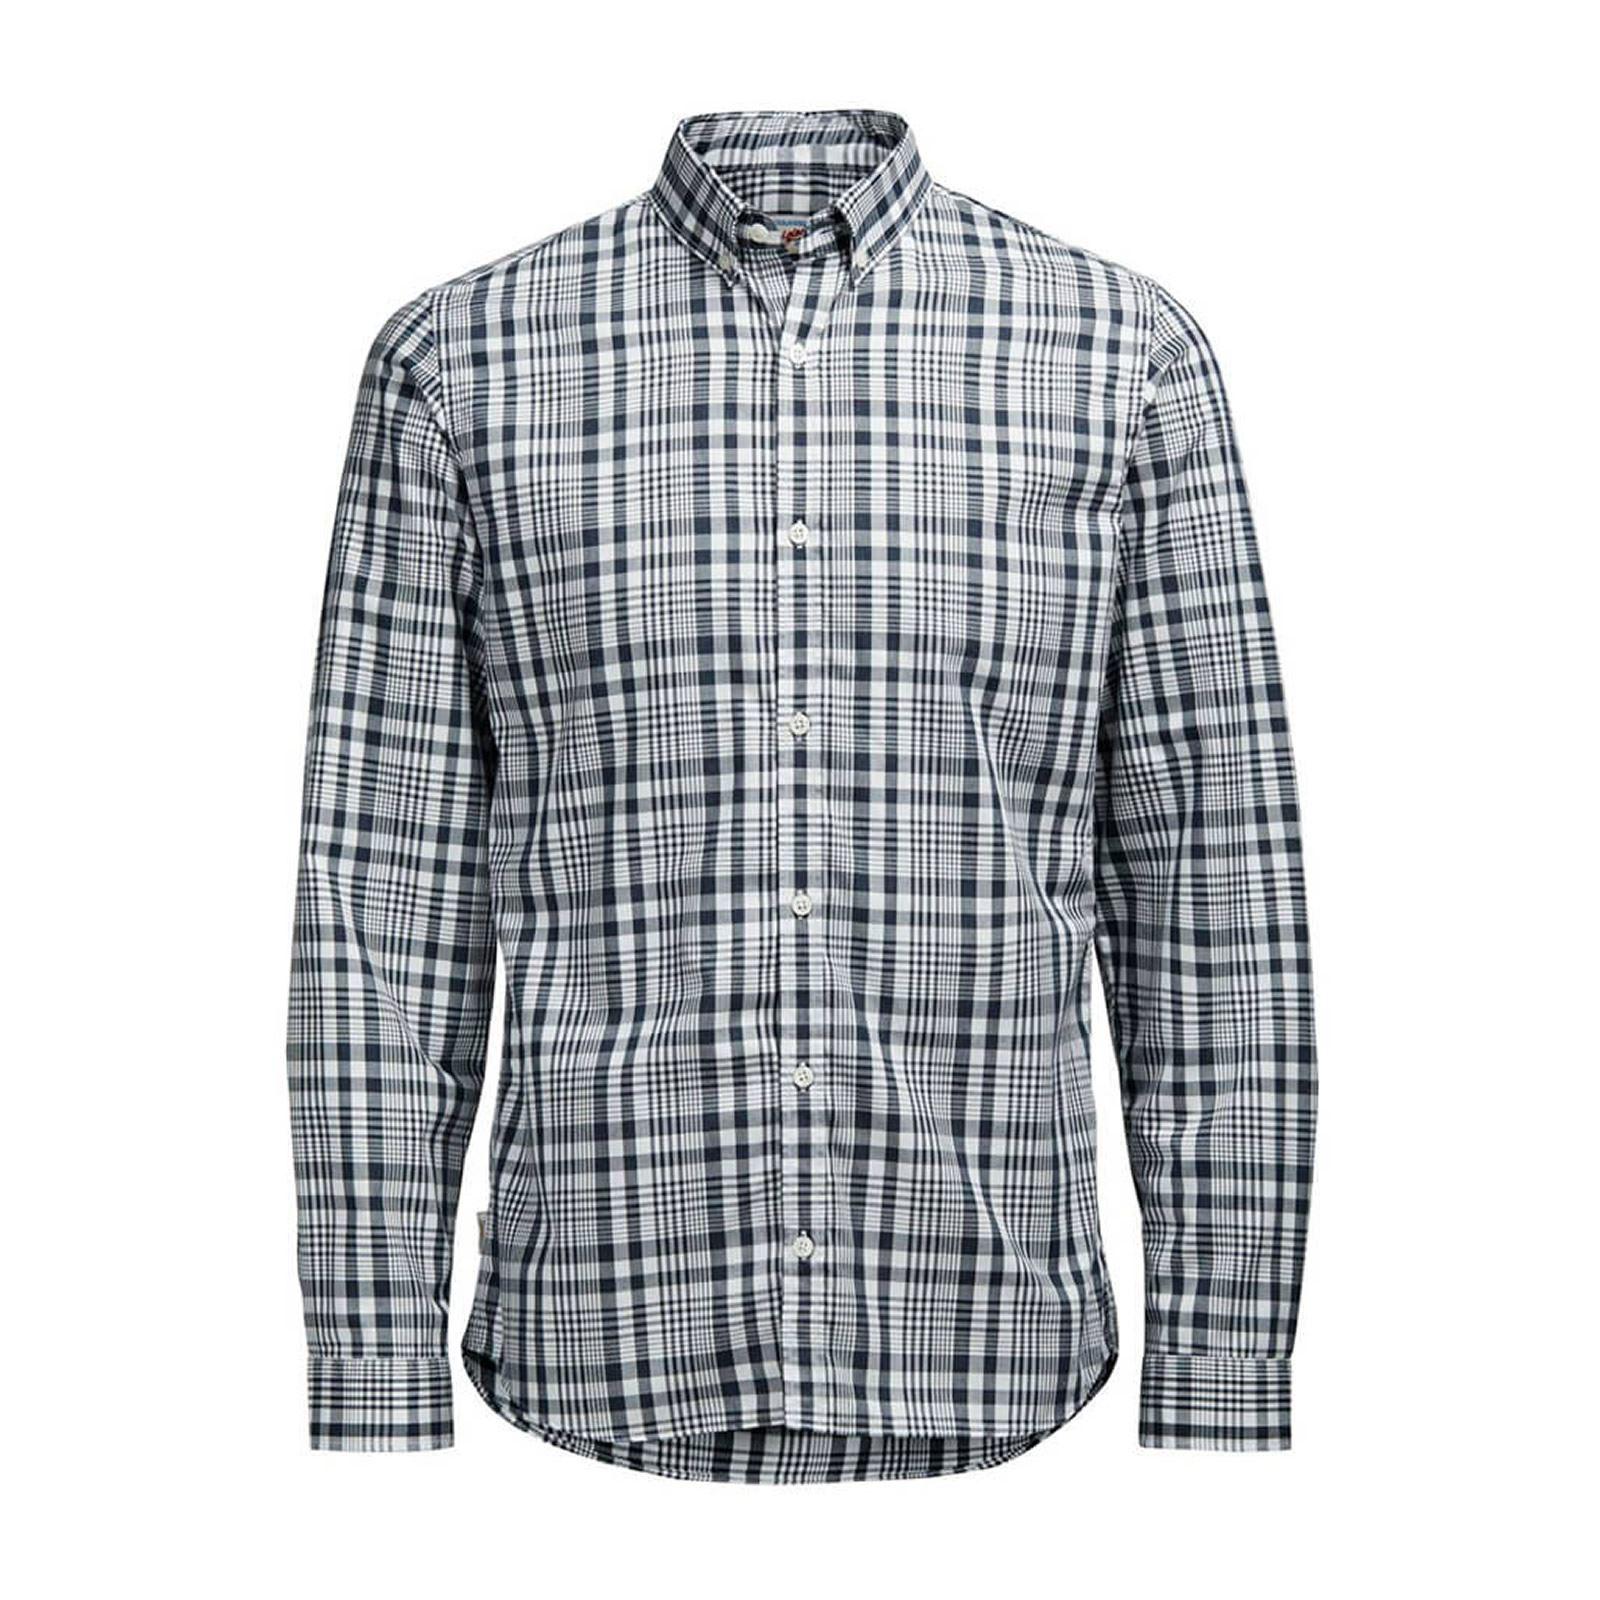 JACK-amp-JONES-Noah-Mens-Check-Shirt-Long-Sleeve-Collared-Cotton-Casual-Shirt thumbnail 3